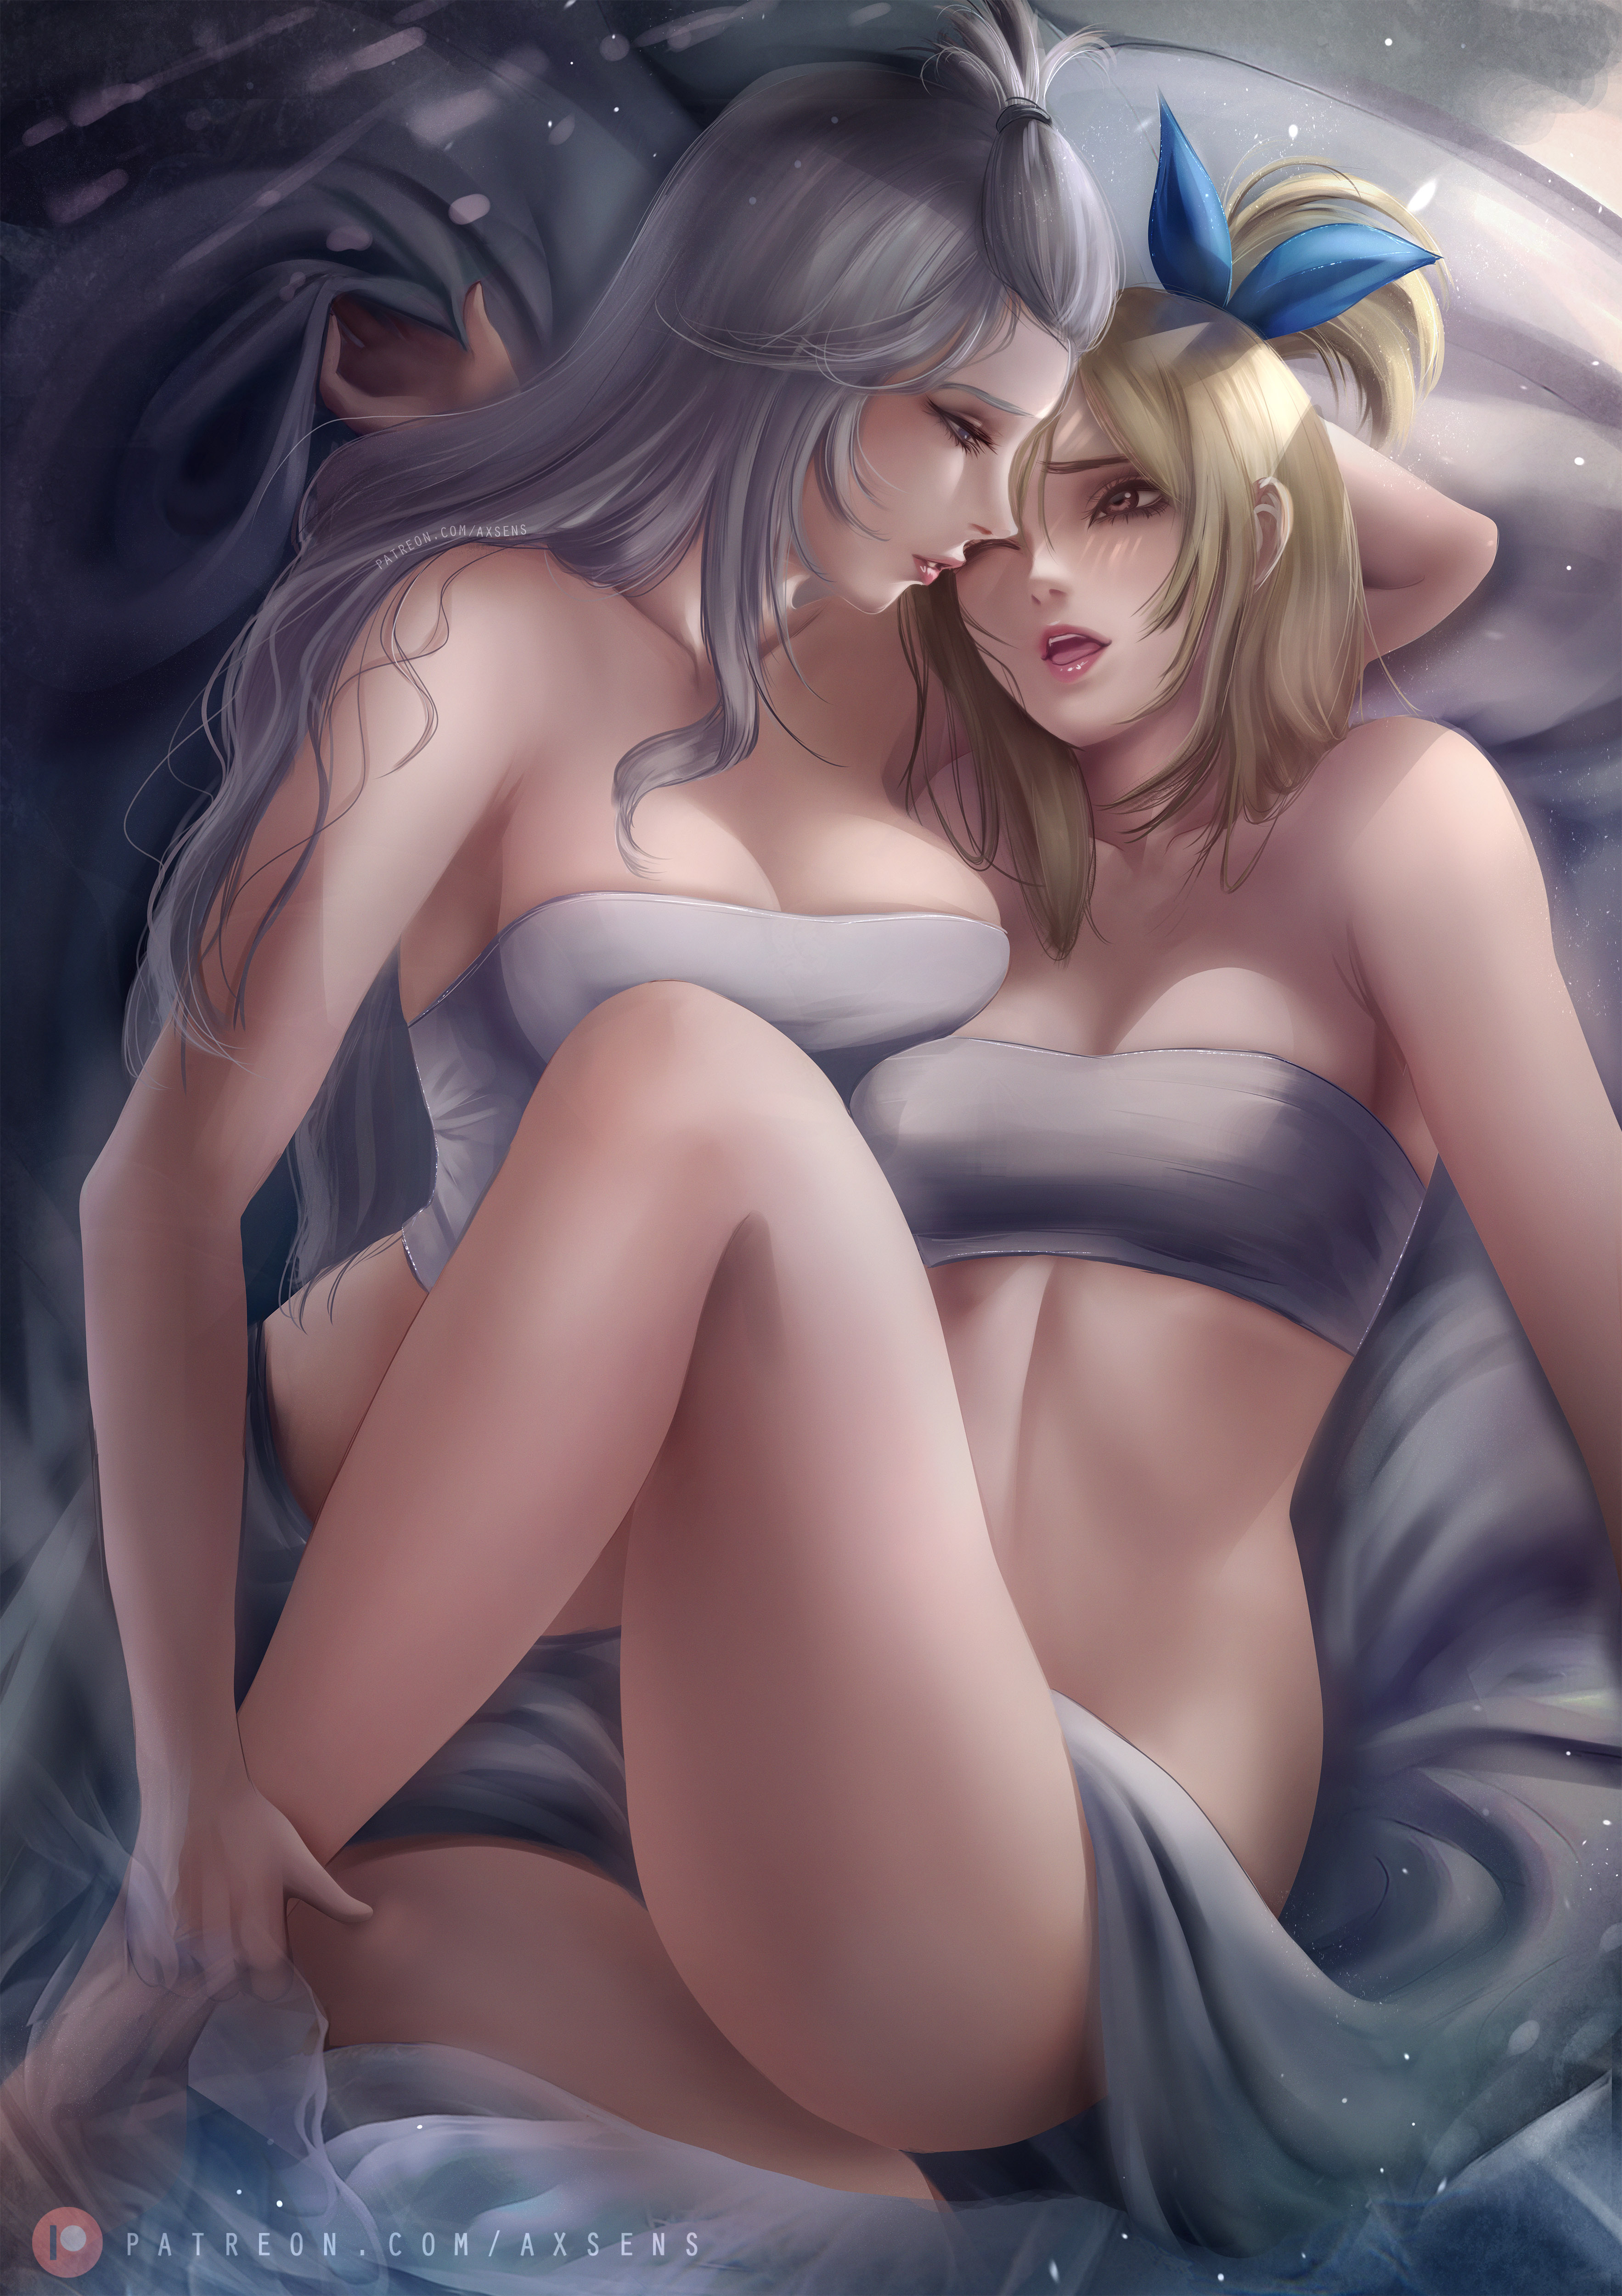 axsens, blonde, two women, lesbians, thighs, legs, short hair, long hair, cleavage, open mouth ...